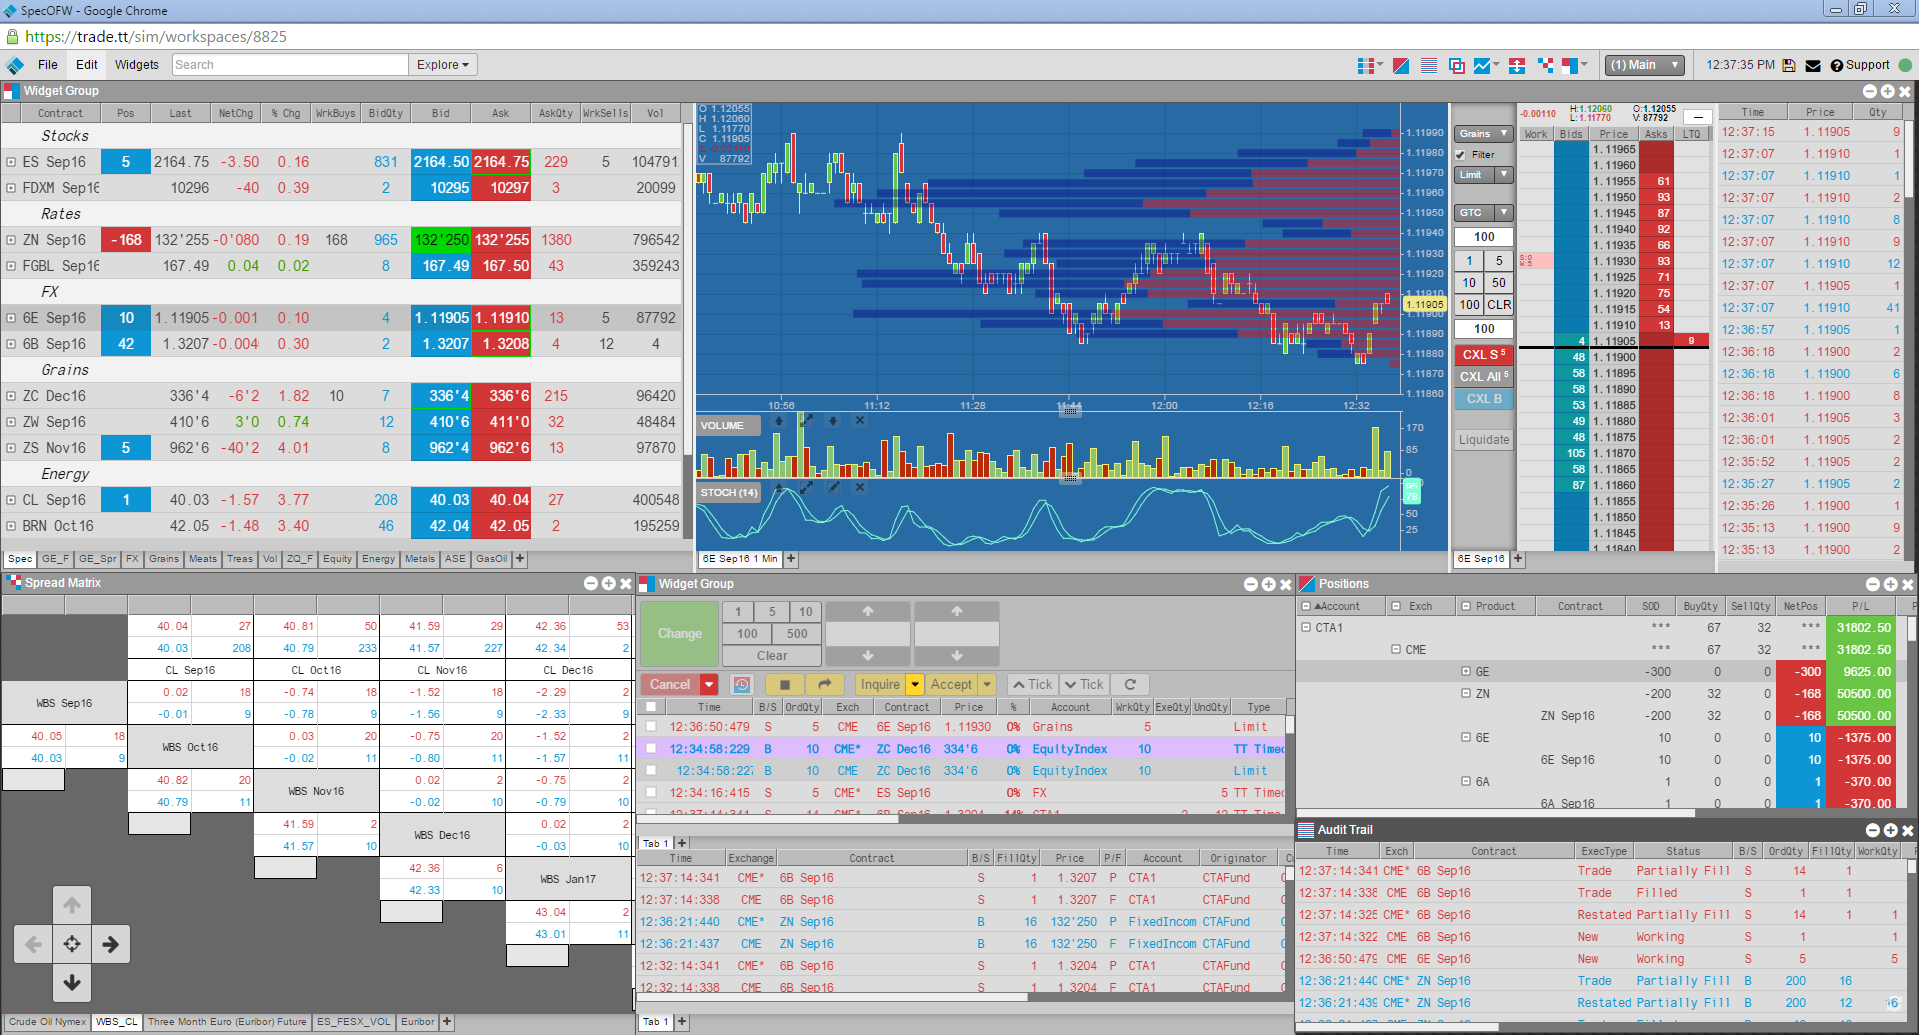 Glecnore commodity trading platform